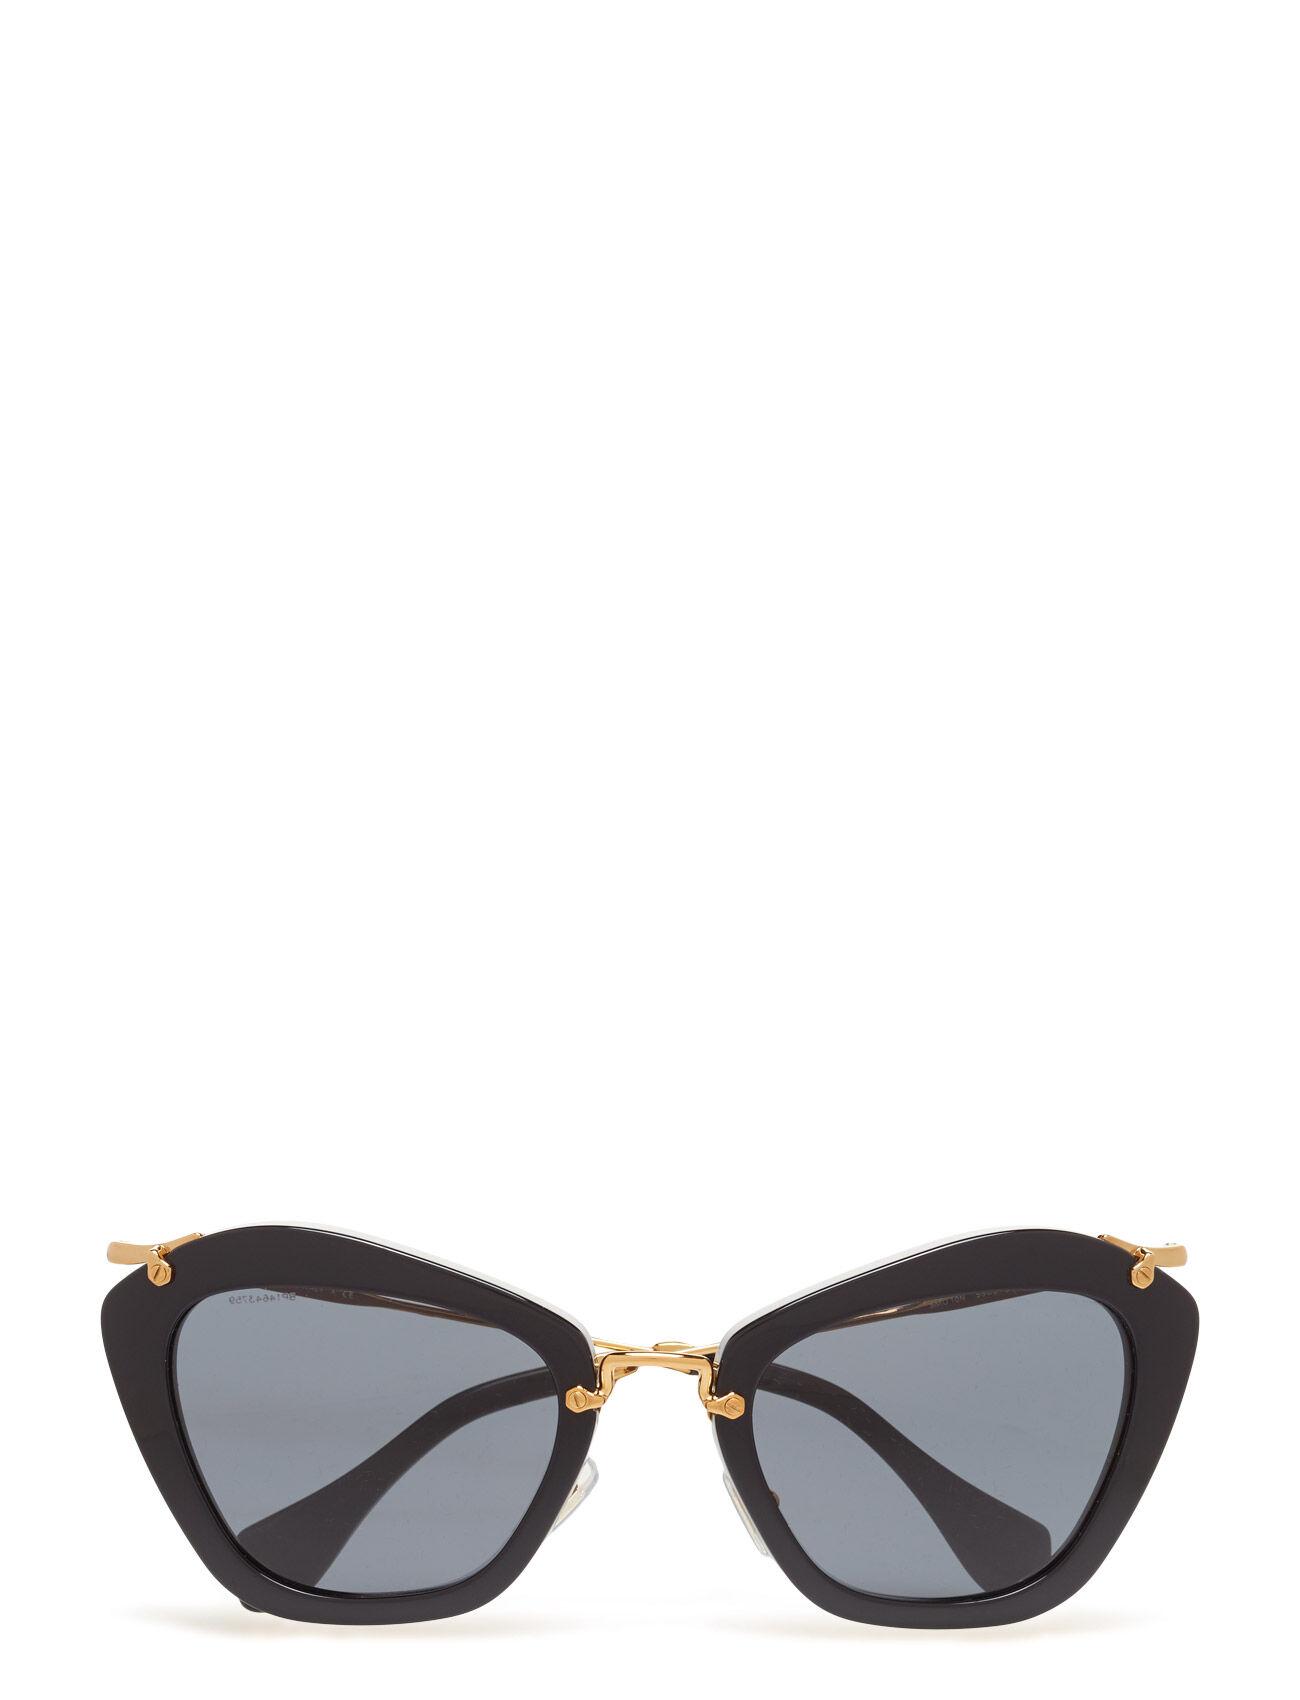 Miu Miu Sunglasses Noir